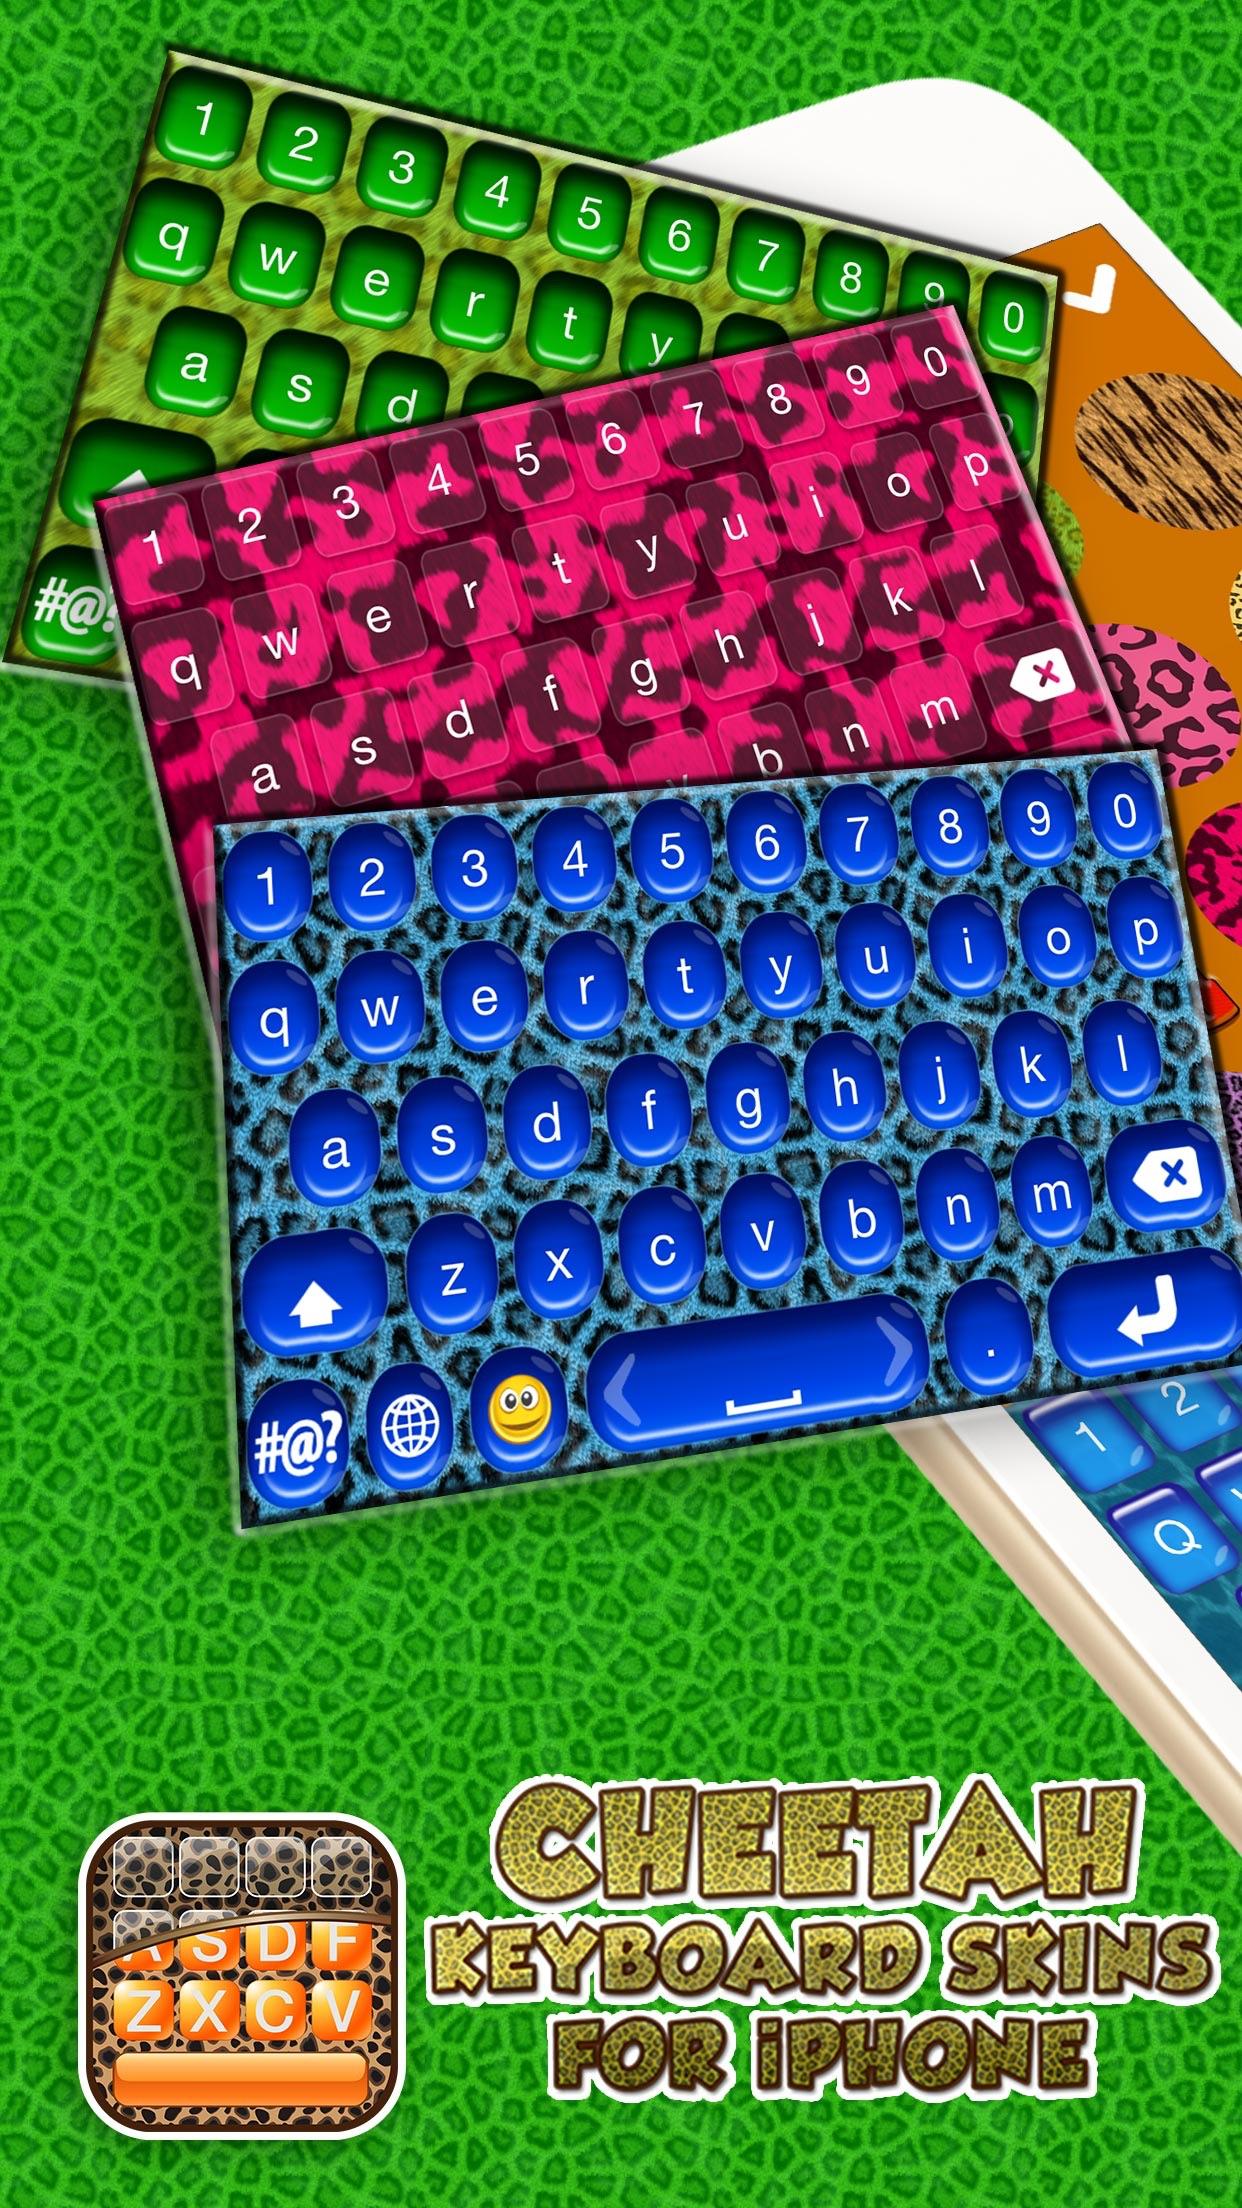 Cheetah Keyboard Skins for iPhone – Animal Print Design.s and Custom Themes Free Screenshot